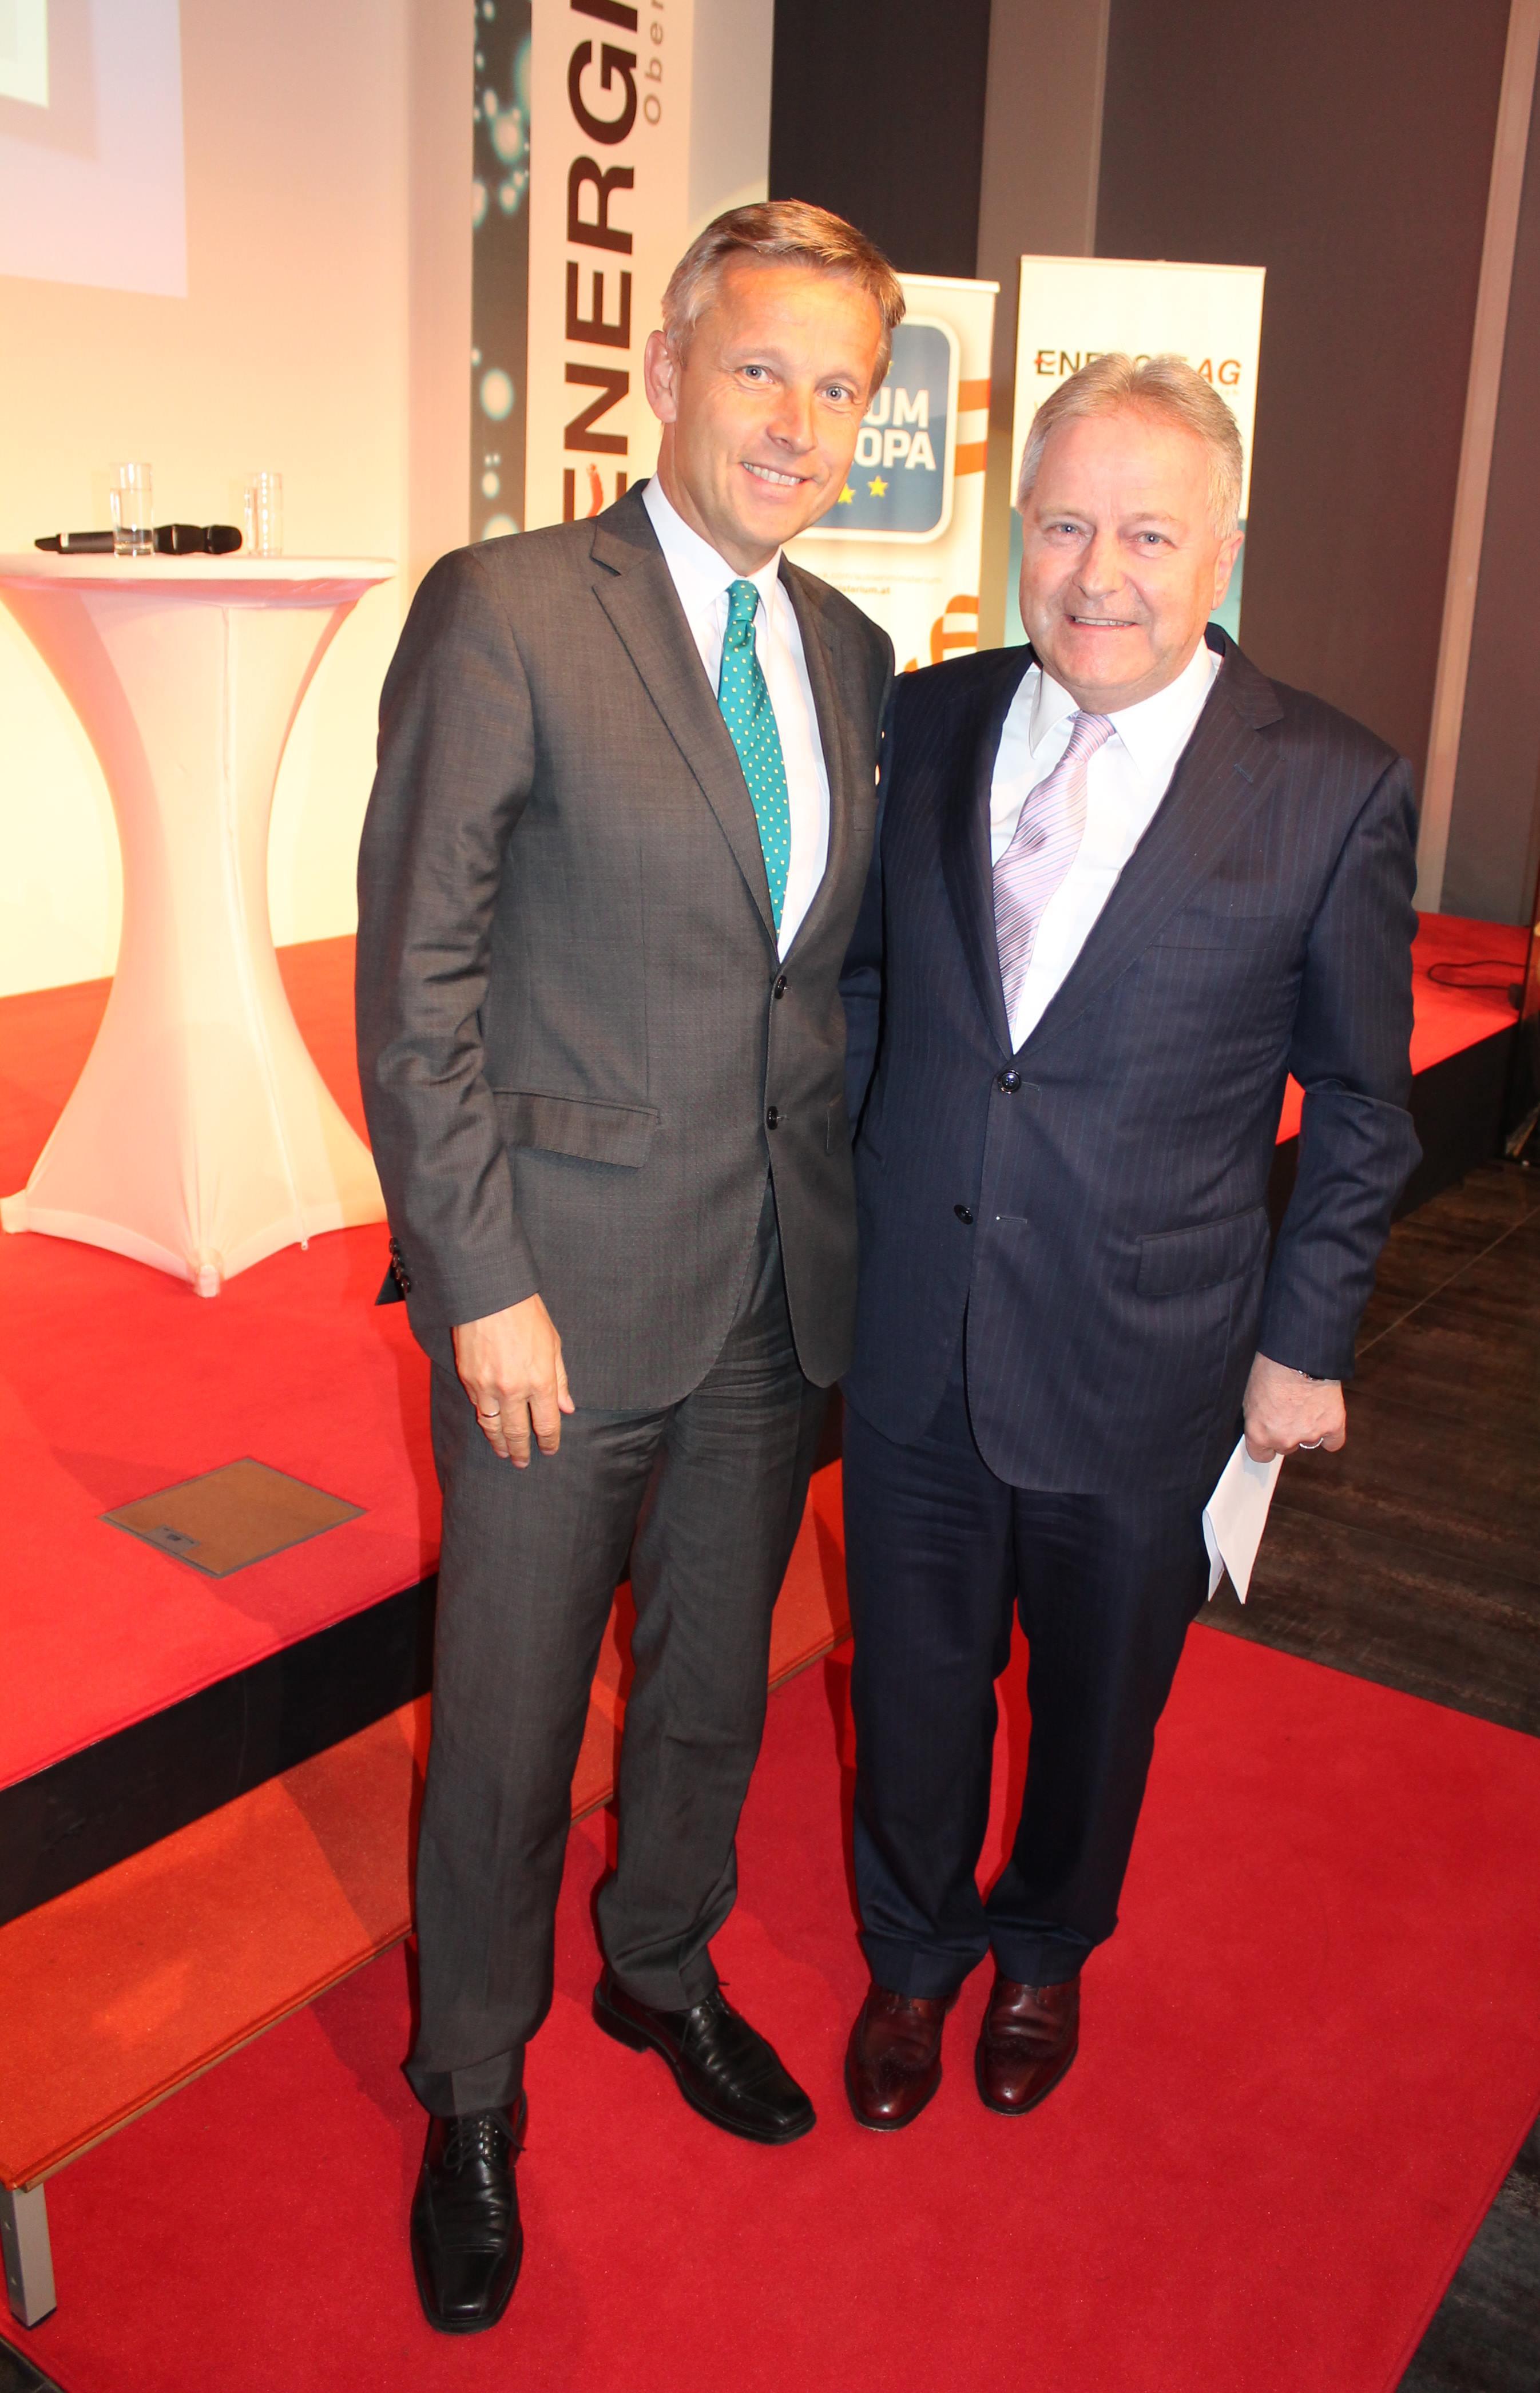 (c) BMEIA, STS Lopatka und Energie AG Generaldirektor Leo Windtner